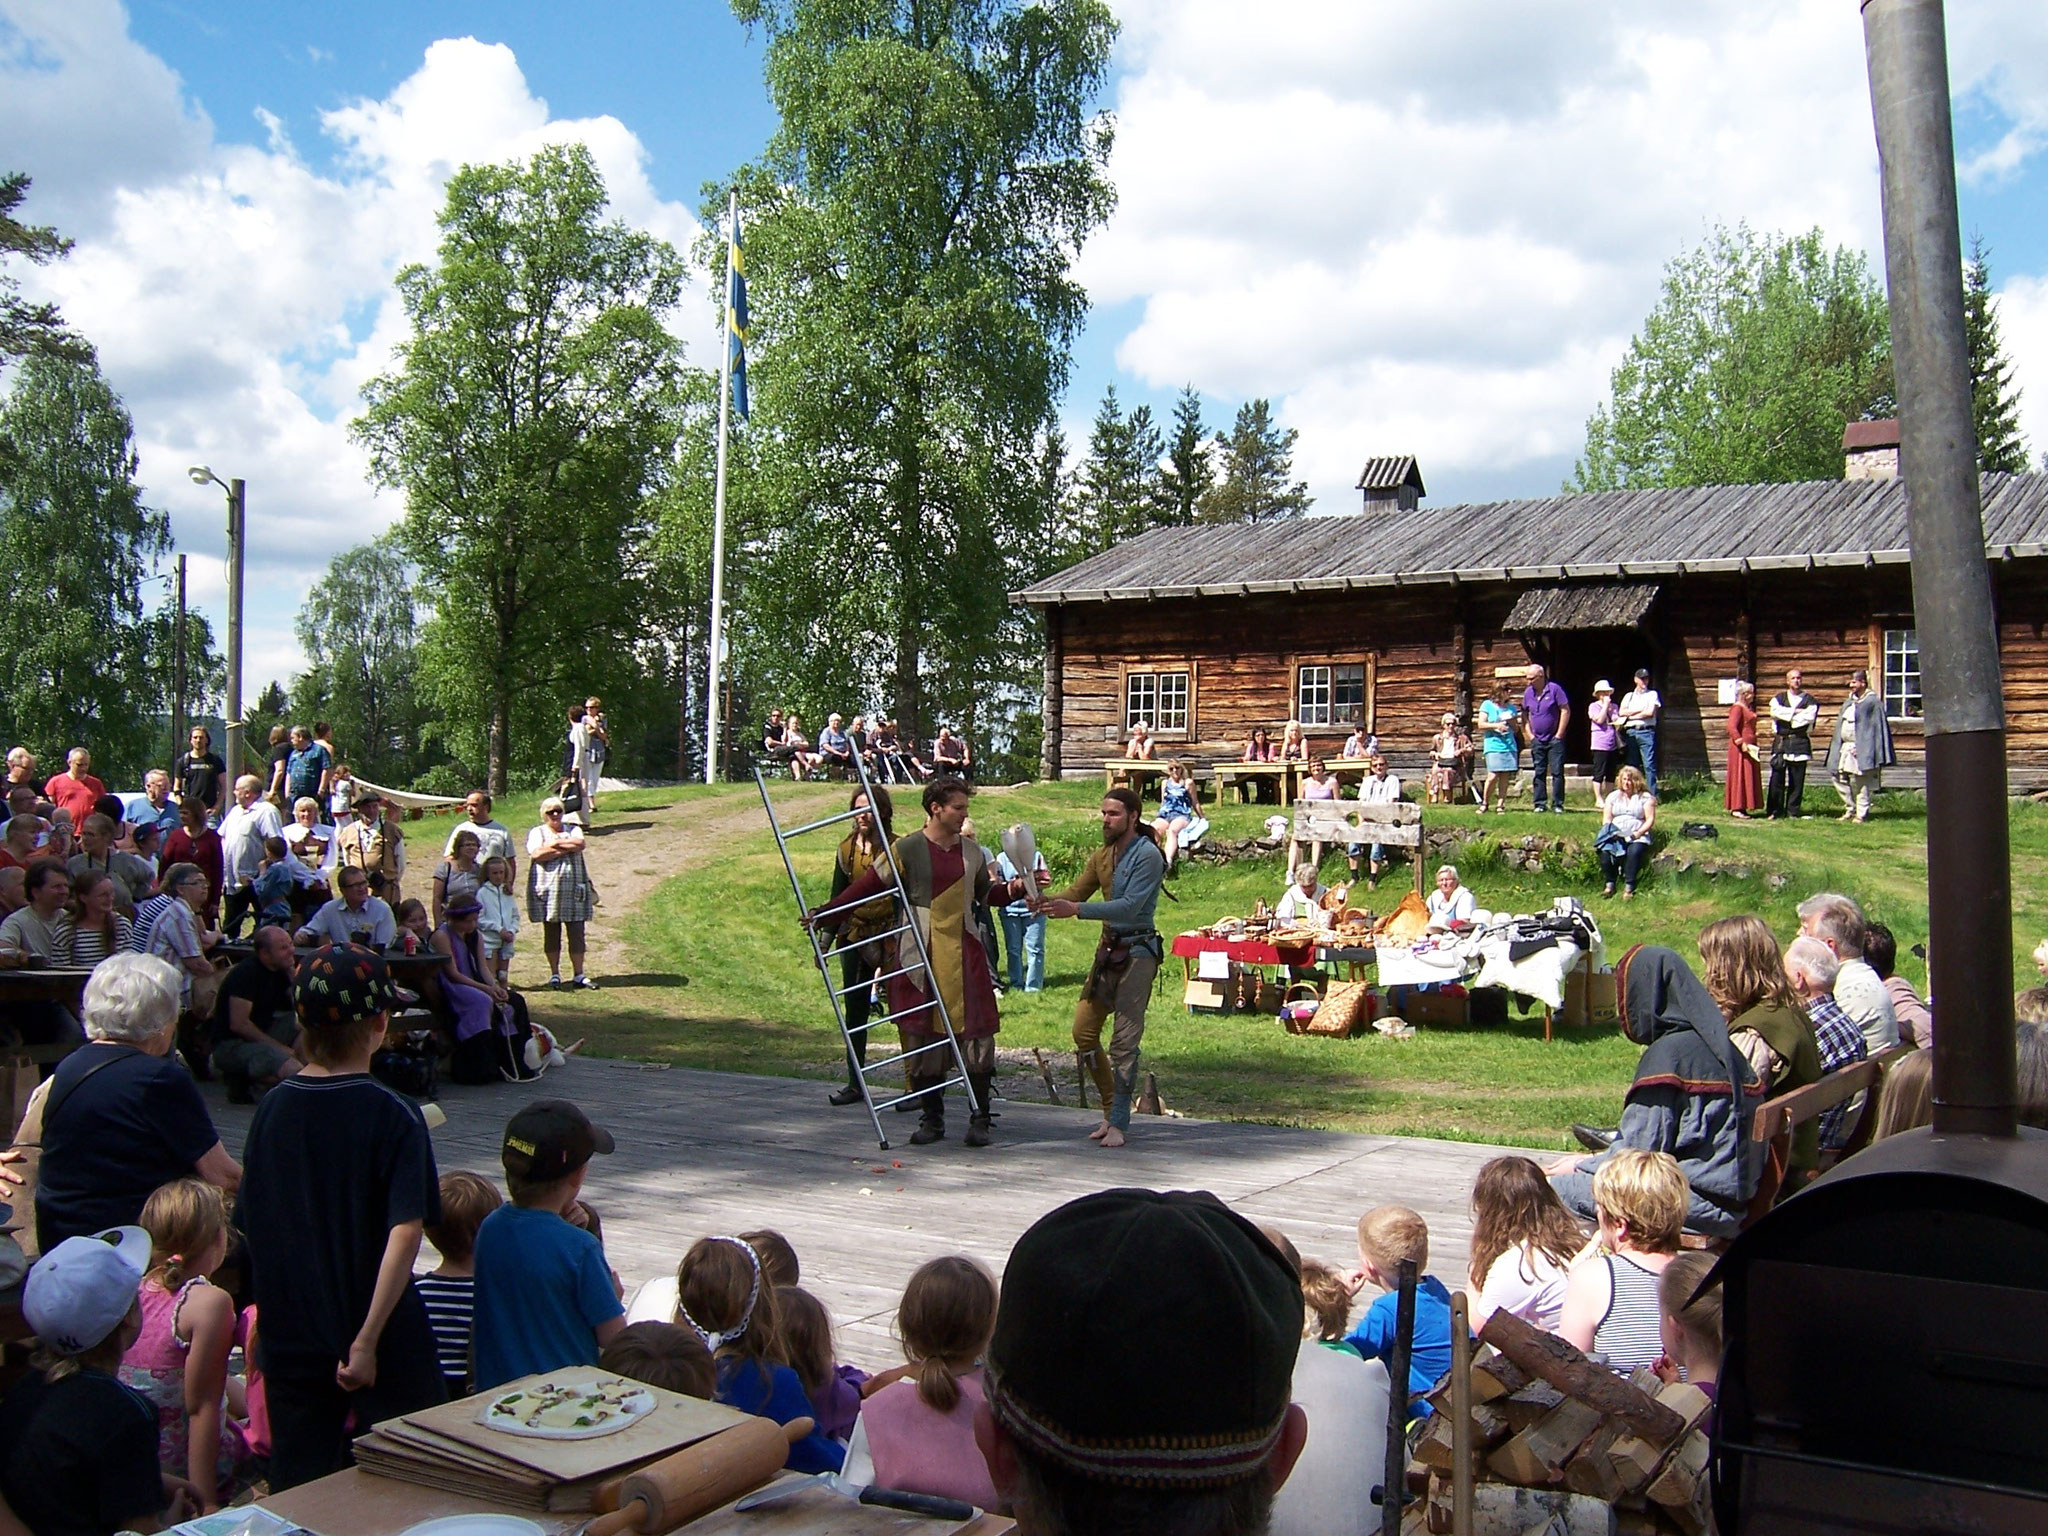 medieval market in Lekvattnet/ Karmen Kynna